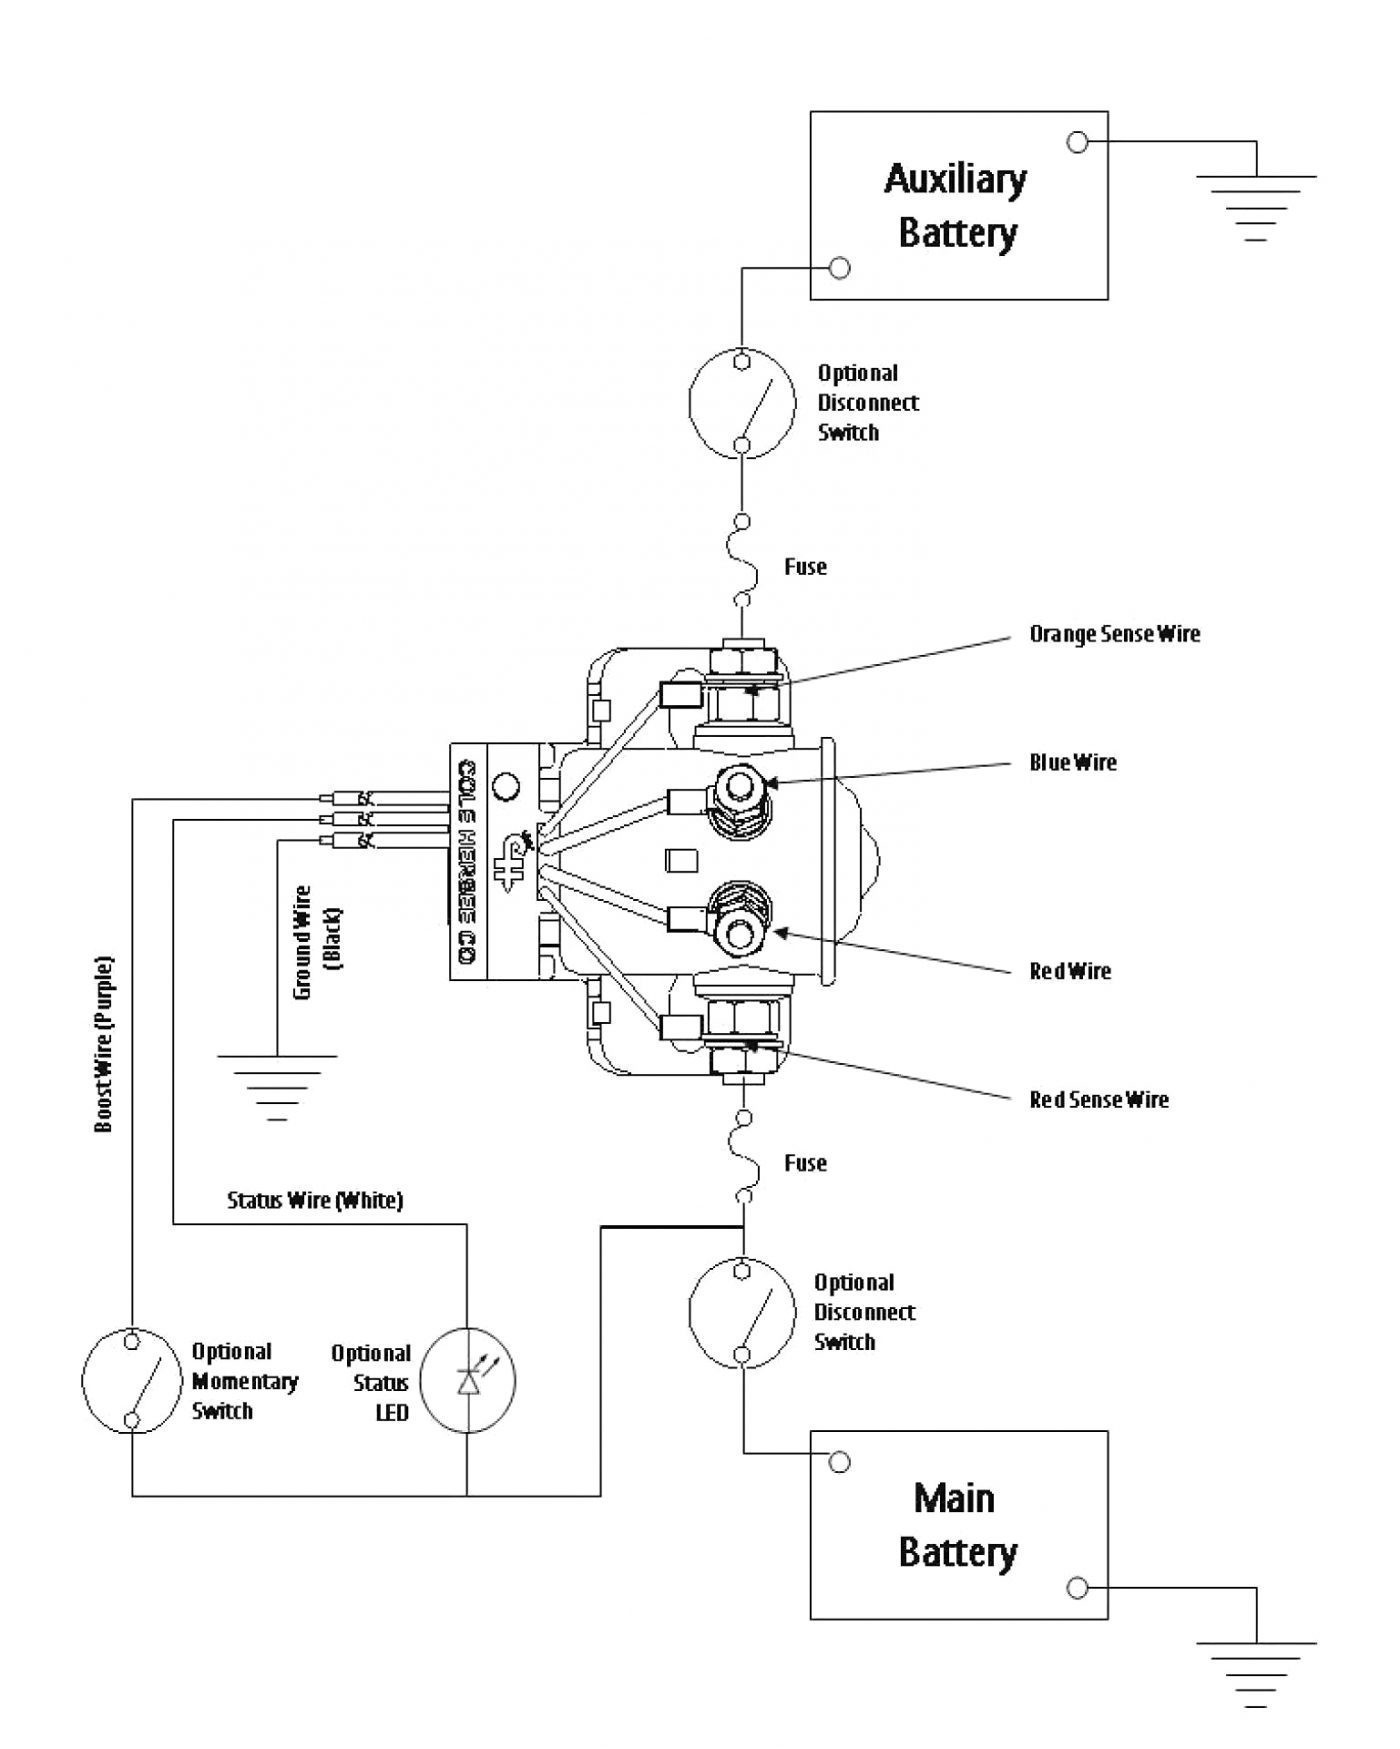 Vdo Oil Pressure Gauge Wiring Instructions Fe 1079] 11 Gauge Wire Diagram Free Diagram Of Vdo Oil Pressure Gauge Wiring Instructions